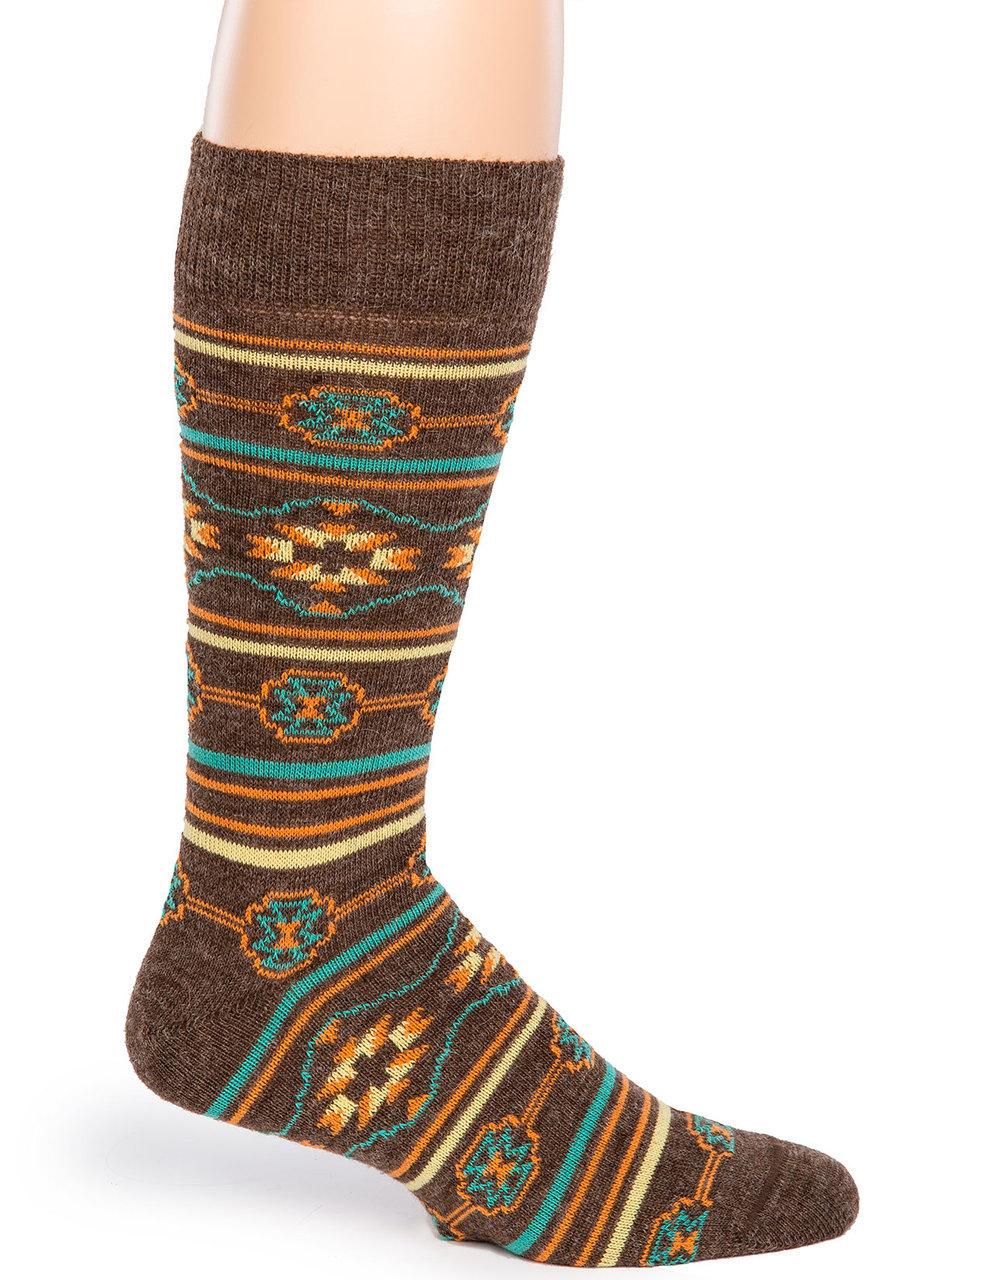 Southwest Socks Side